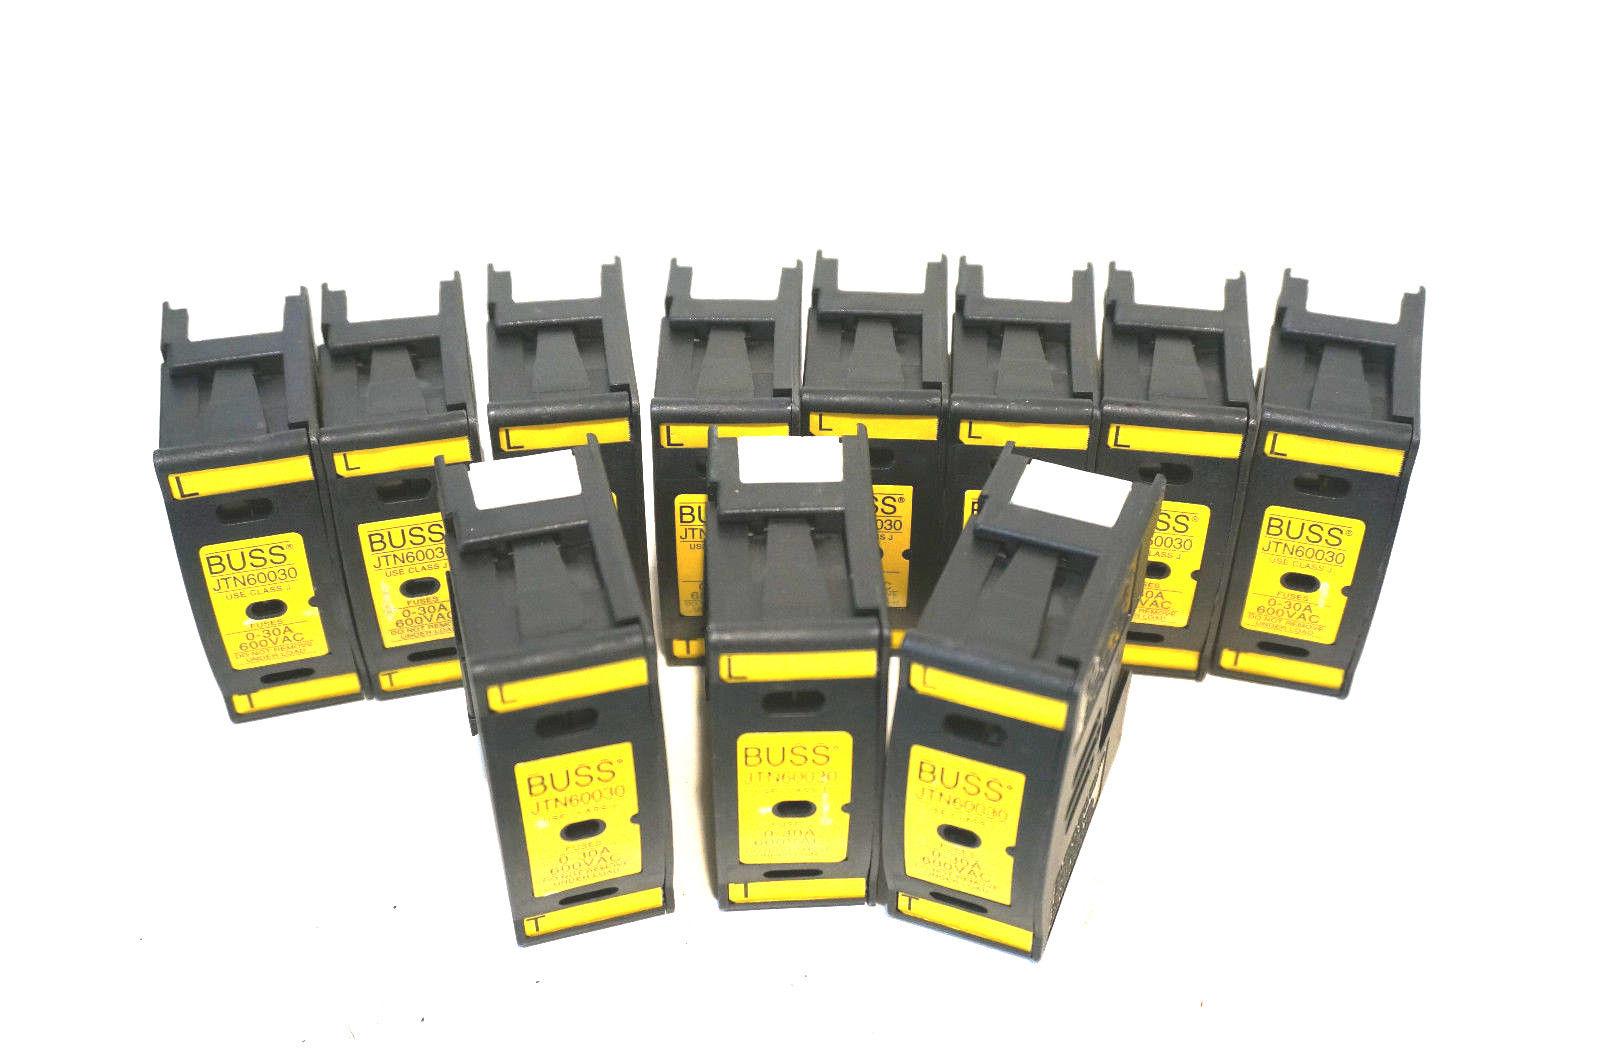 Wiring A Cutler Hammer Fuse Box Auto Electrical Diagram Murray